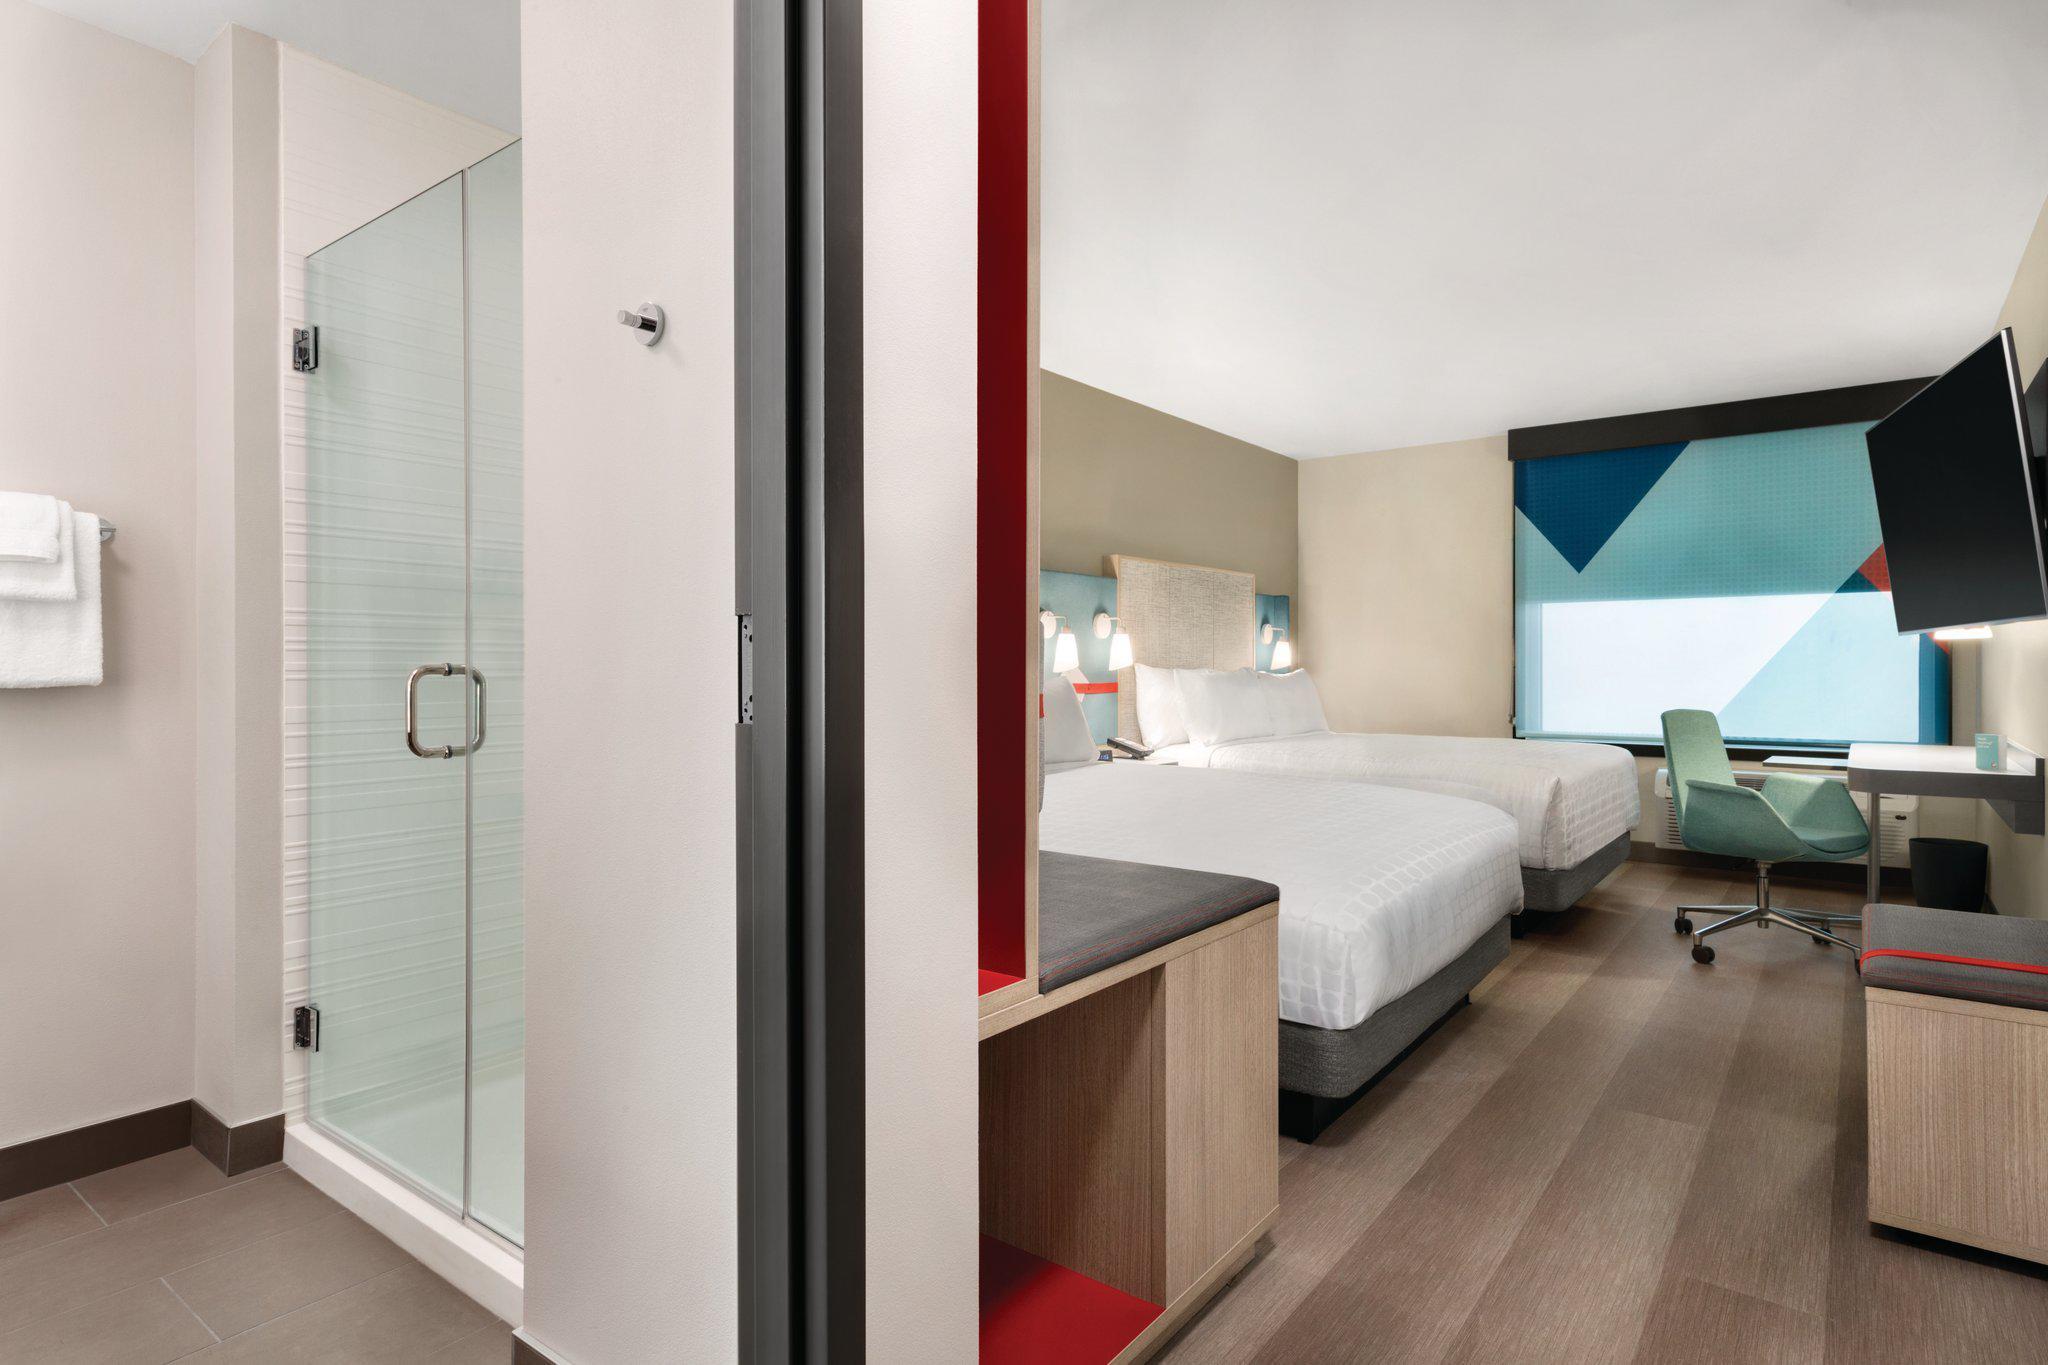 avid hotel Oklahoma City - Quail Springs, an IHG Hotel